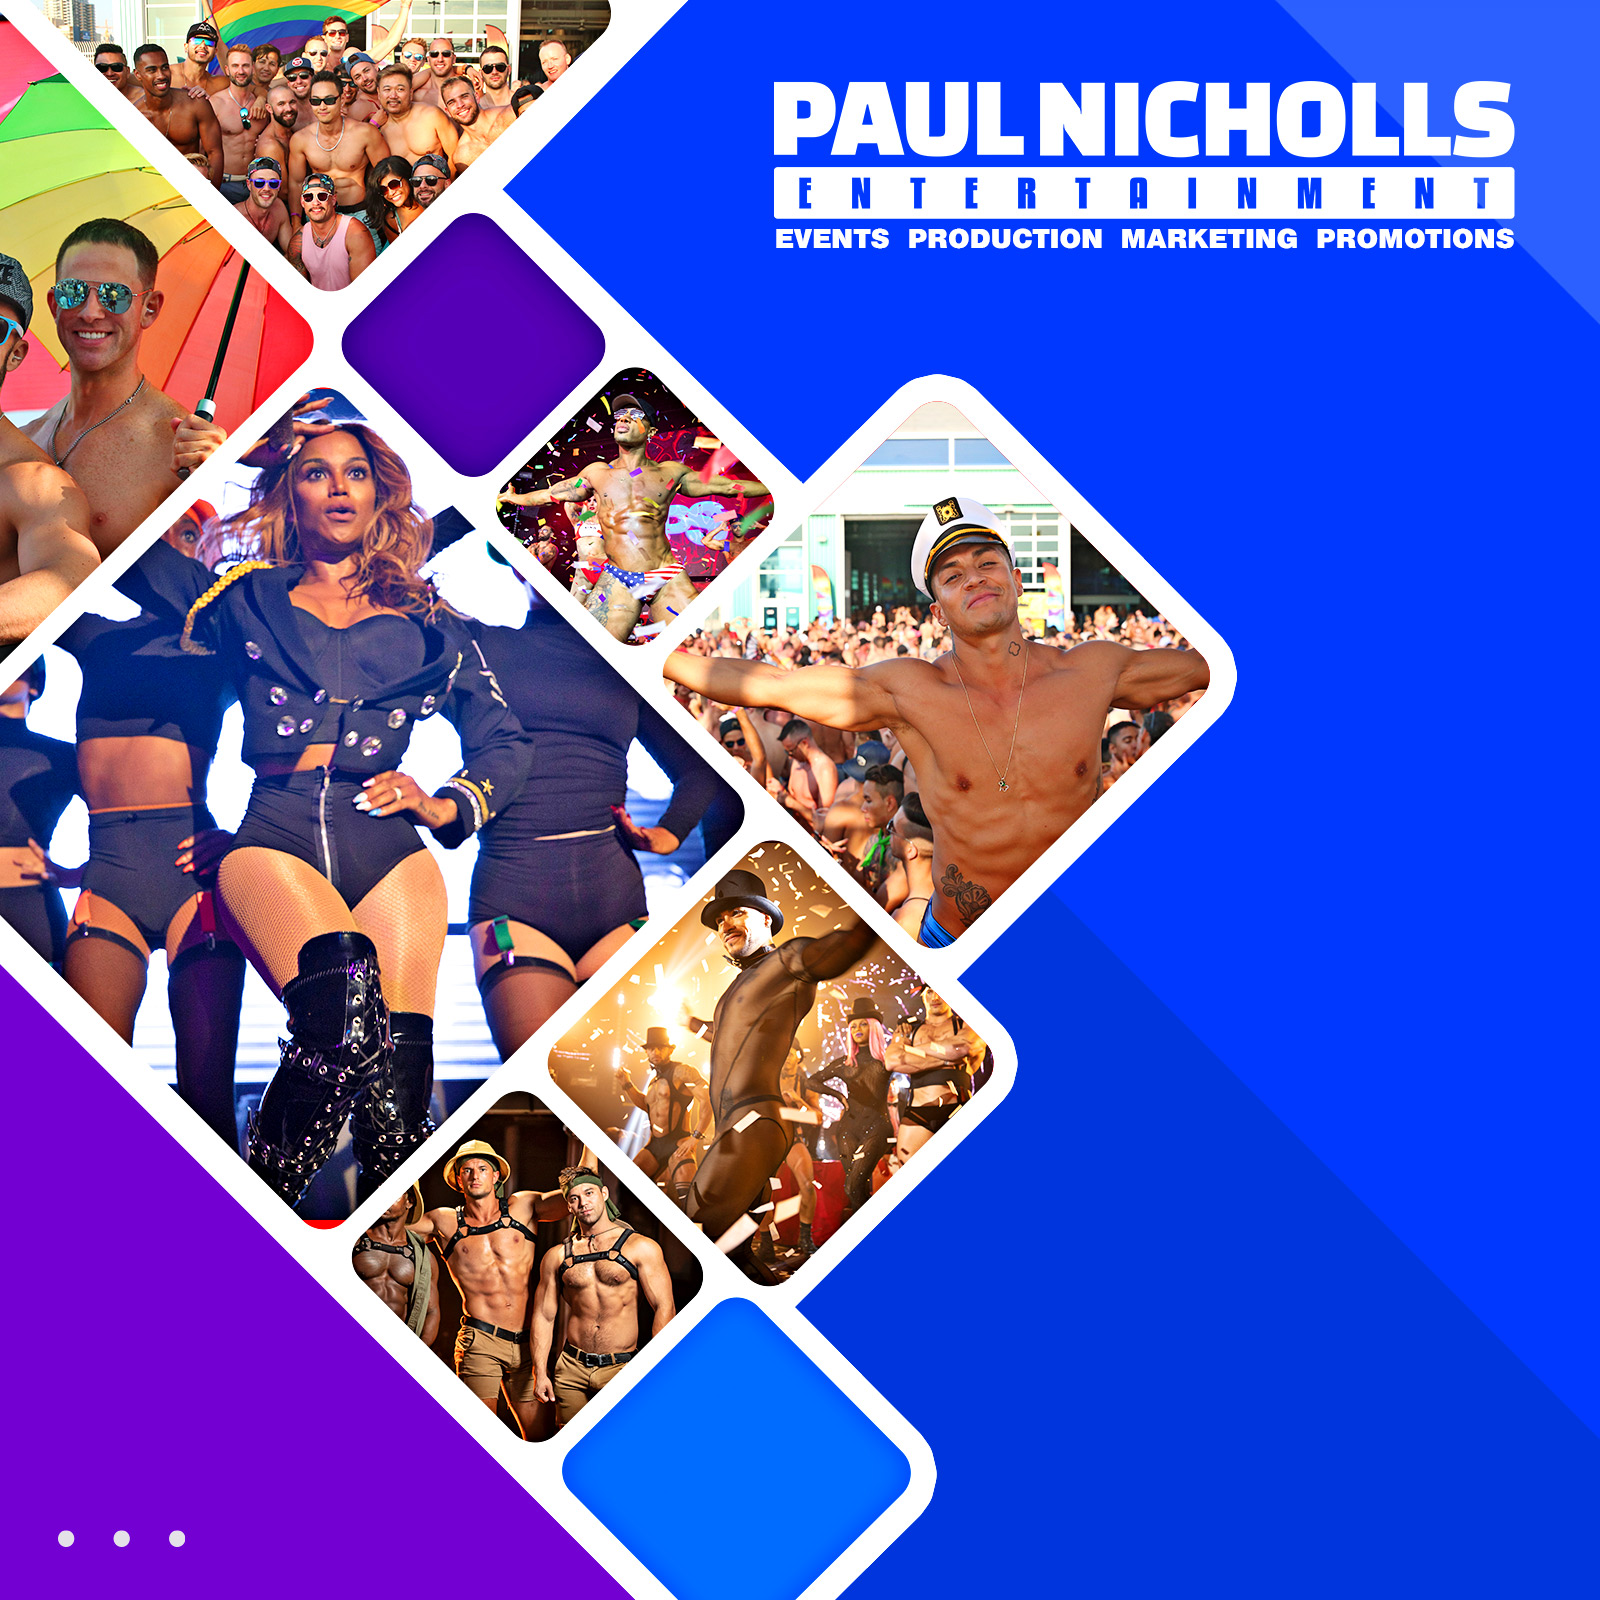 Paul Nicholls ENT: Main Image